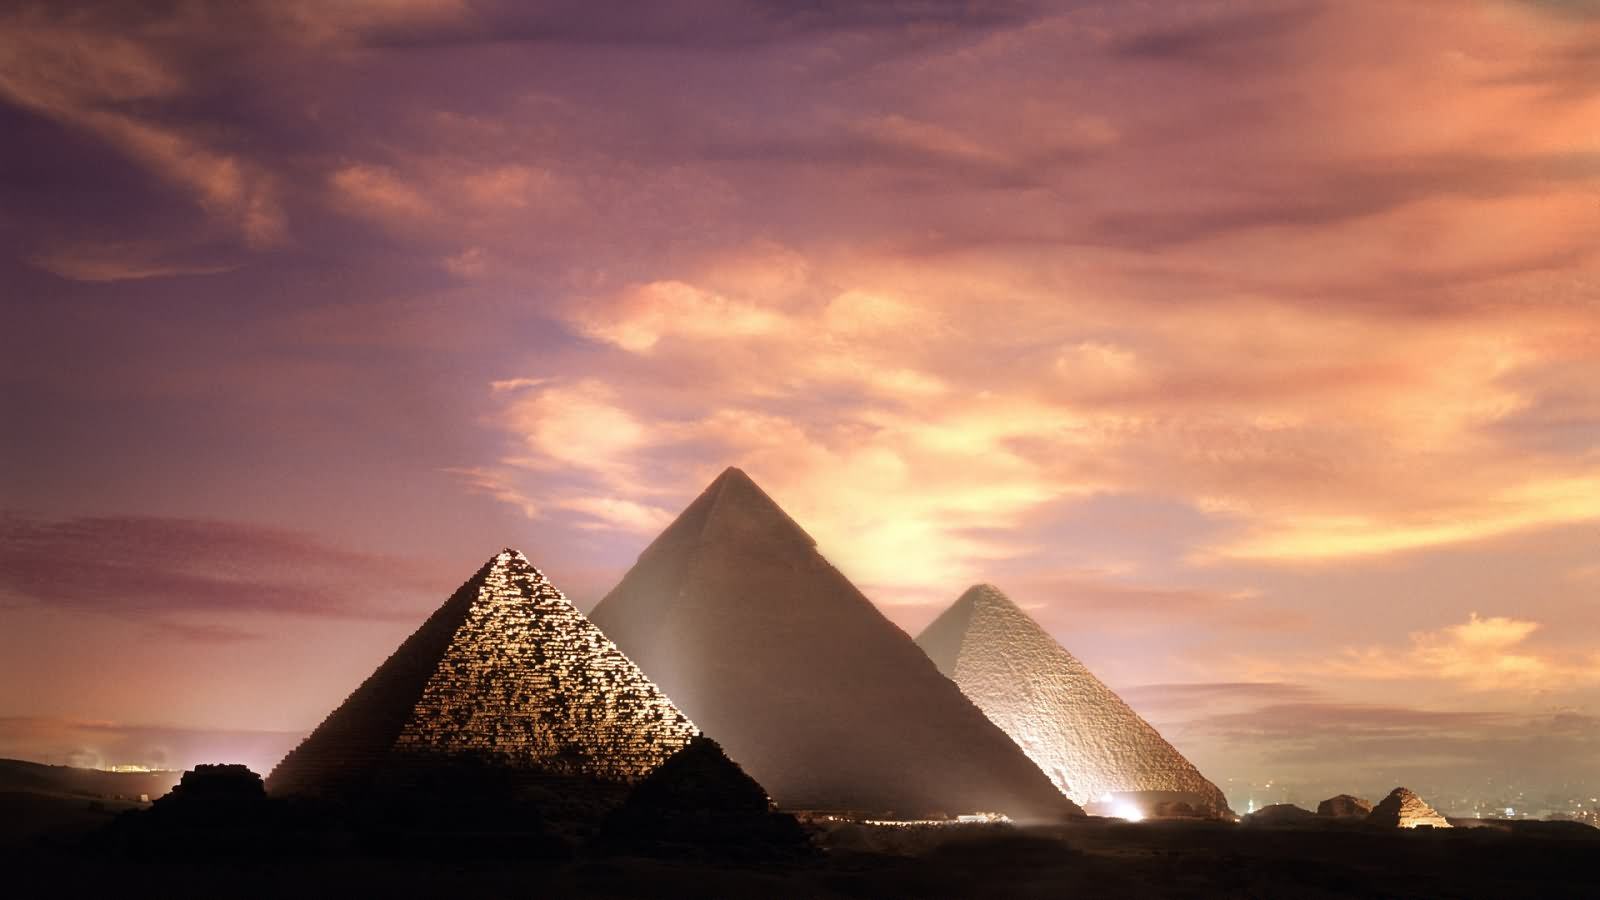 Egyptian Pyramids Illuminated During Sunset